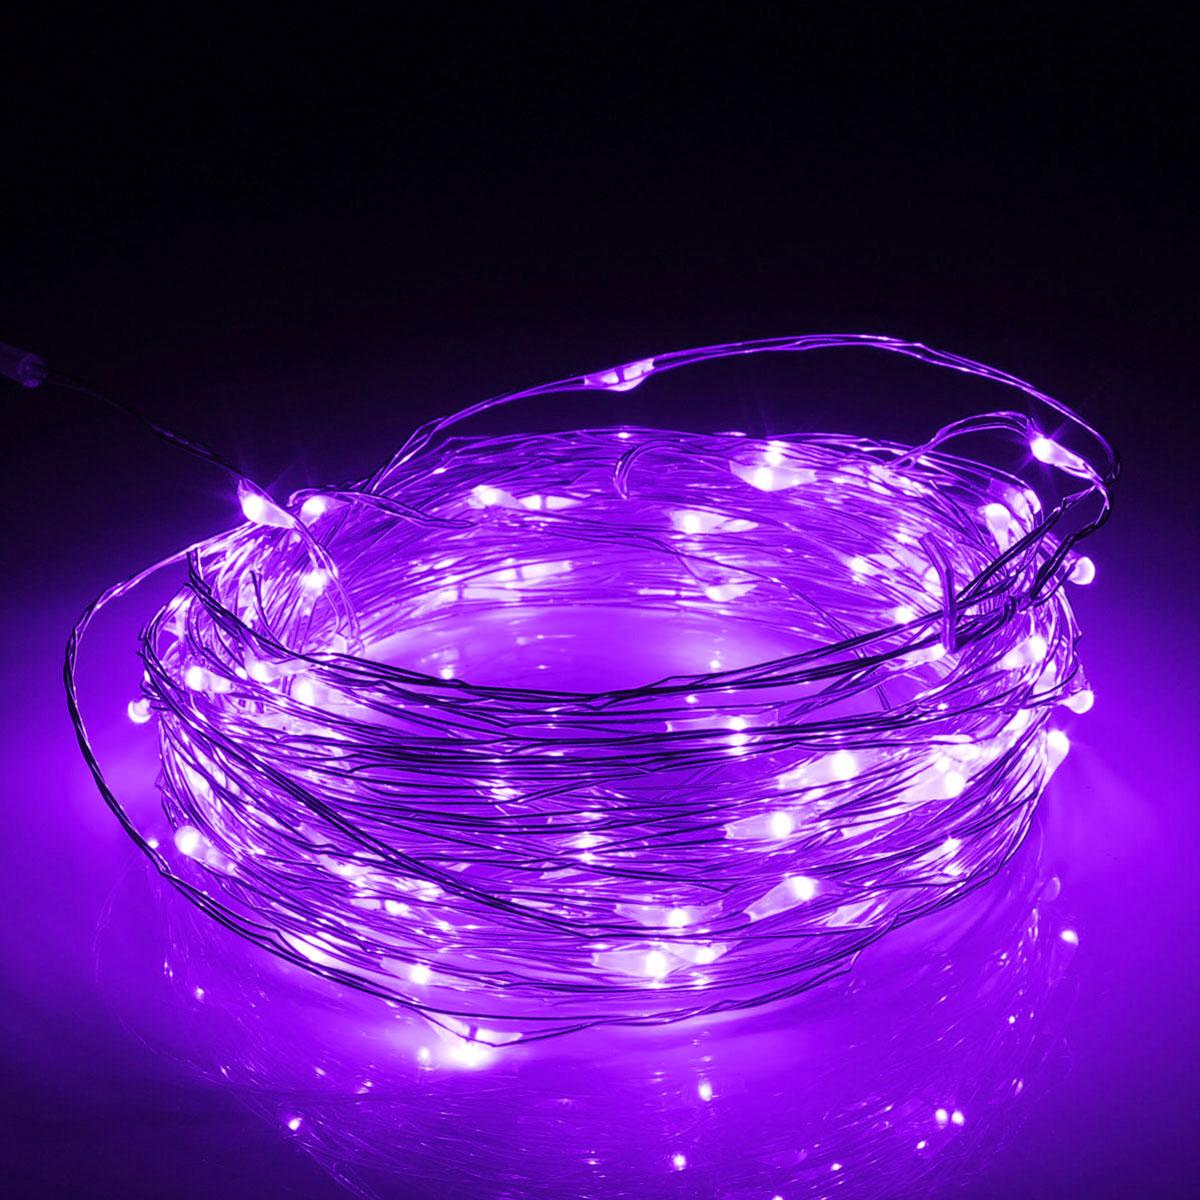 13M 120LED Outdoor Solar Power Sliver String Fairy Light Wedding Party Xmas Garden Lamp IP67